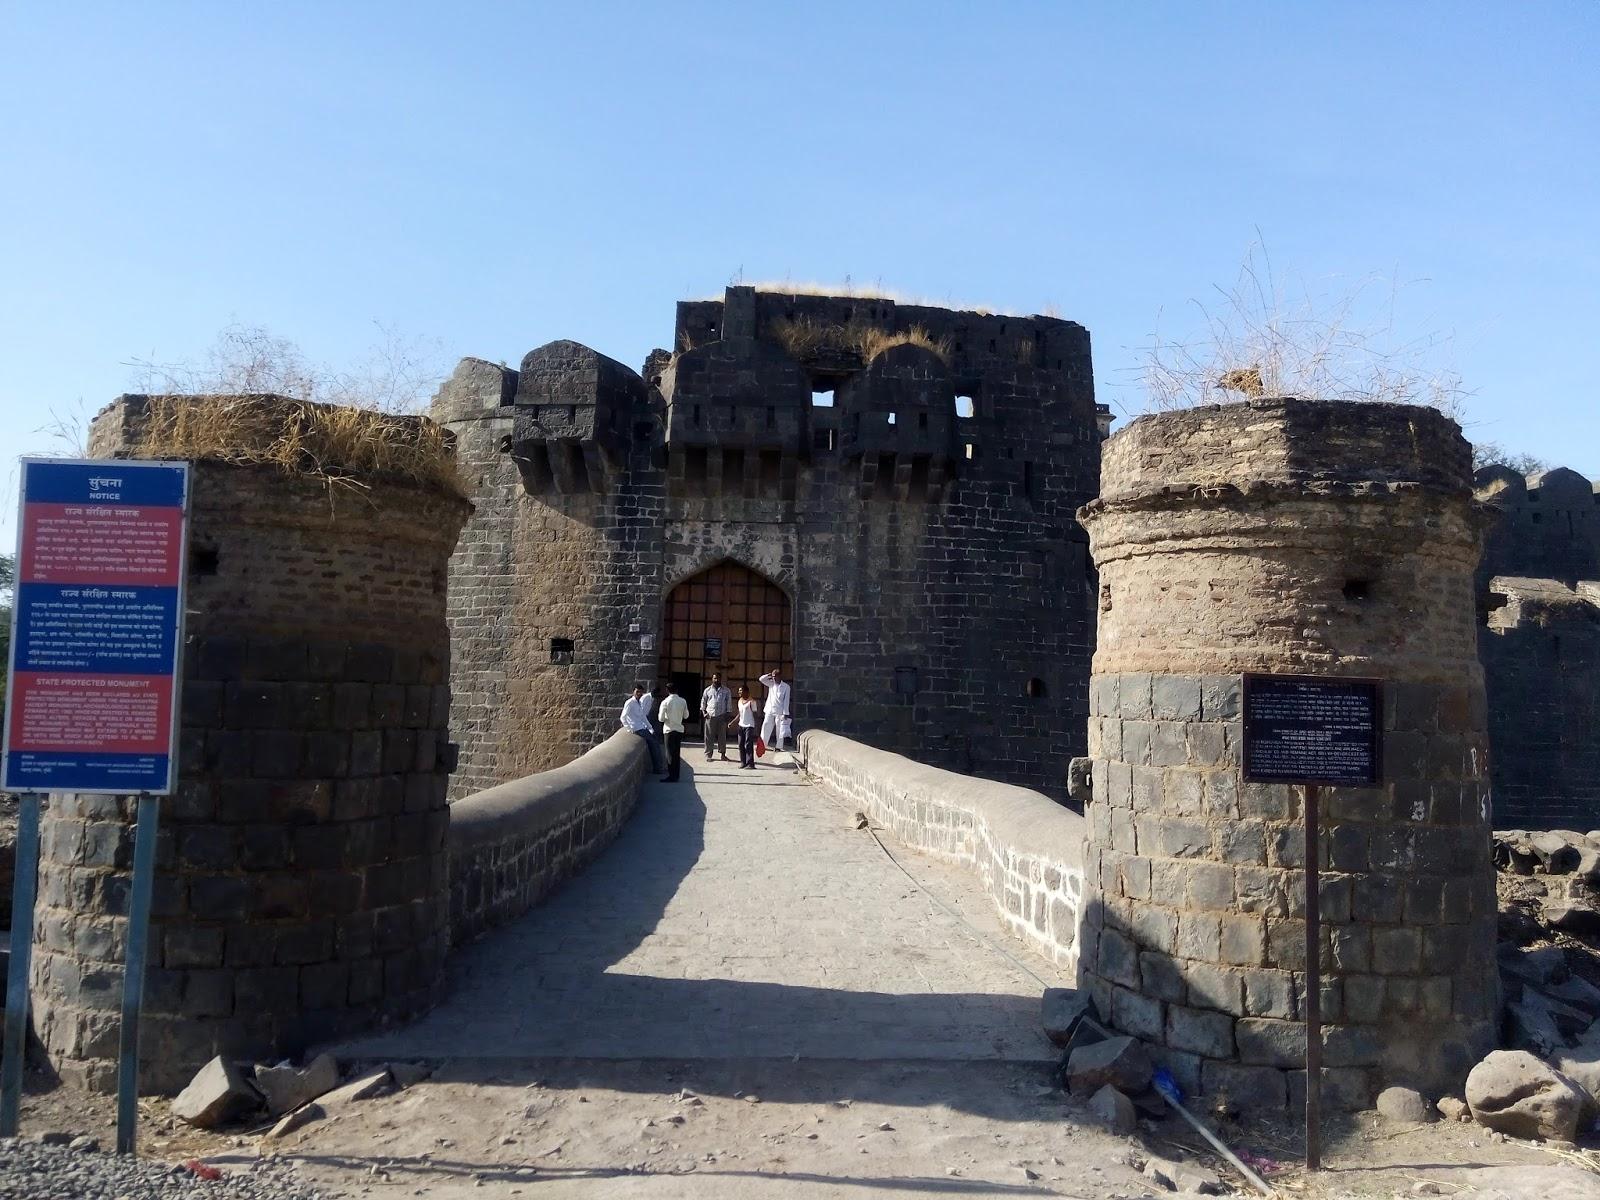 Paranda Fort - The Fort Showing Maharashtra's Defense Logic